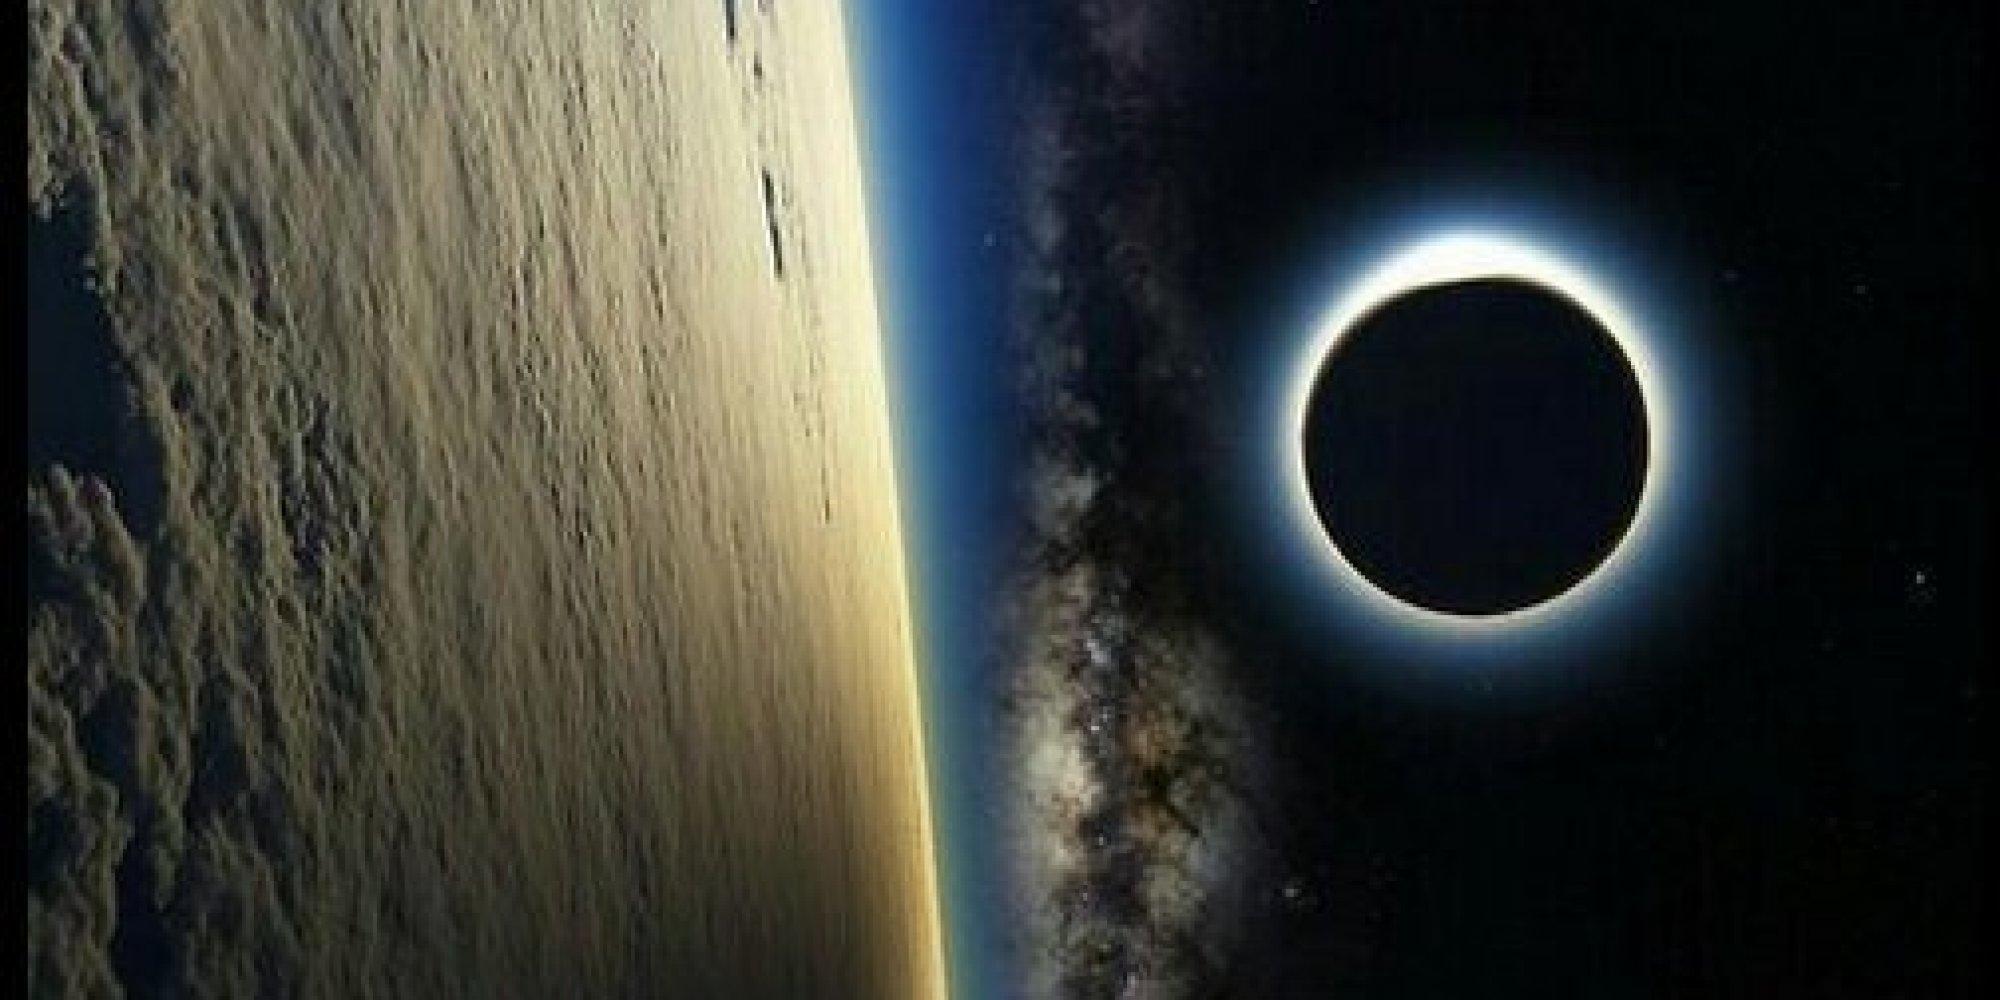 lunar eclipse space station - photo #12